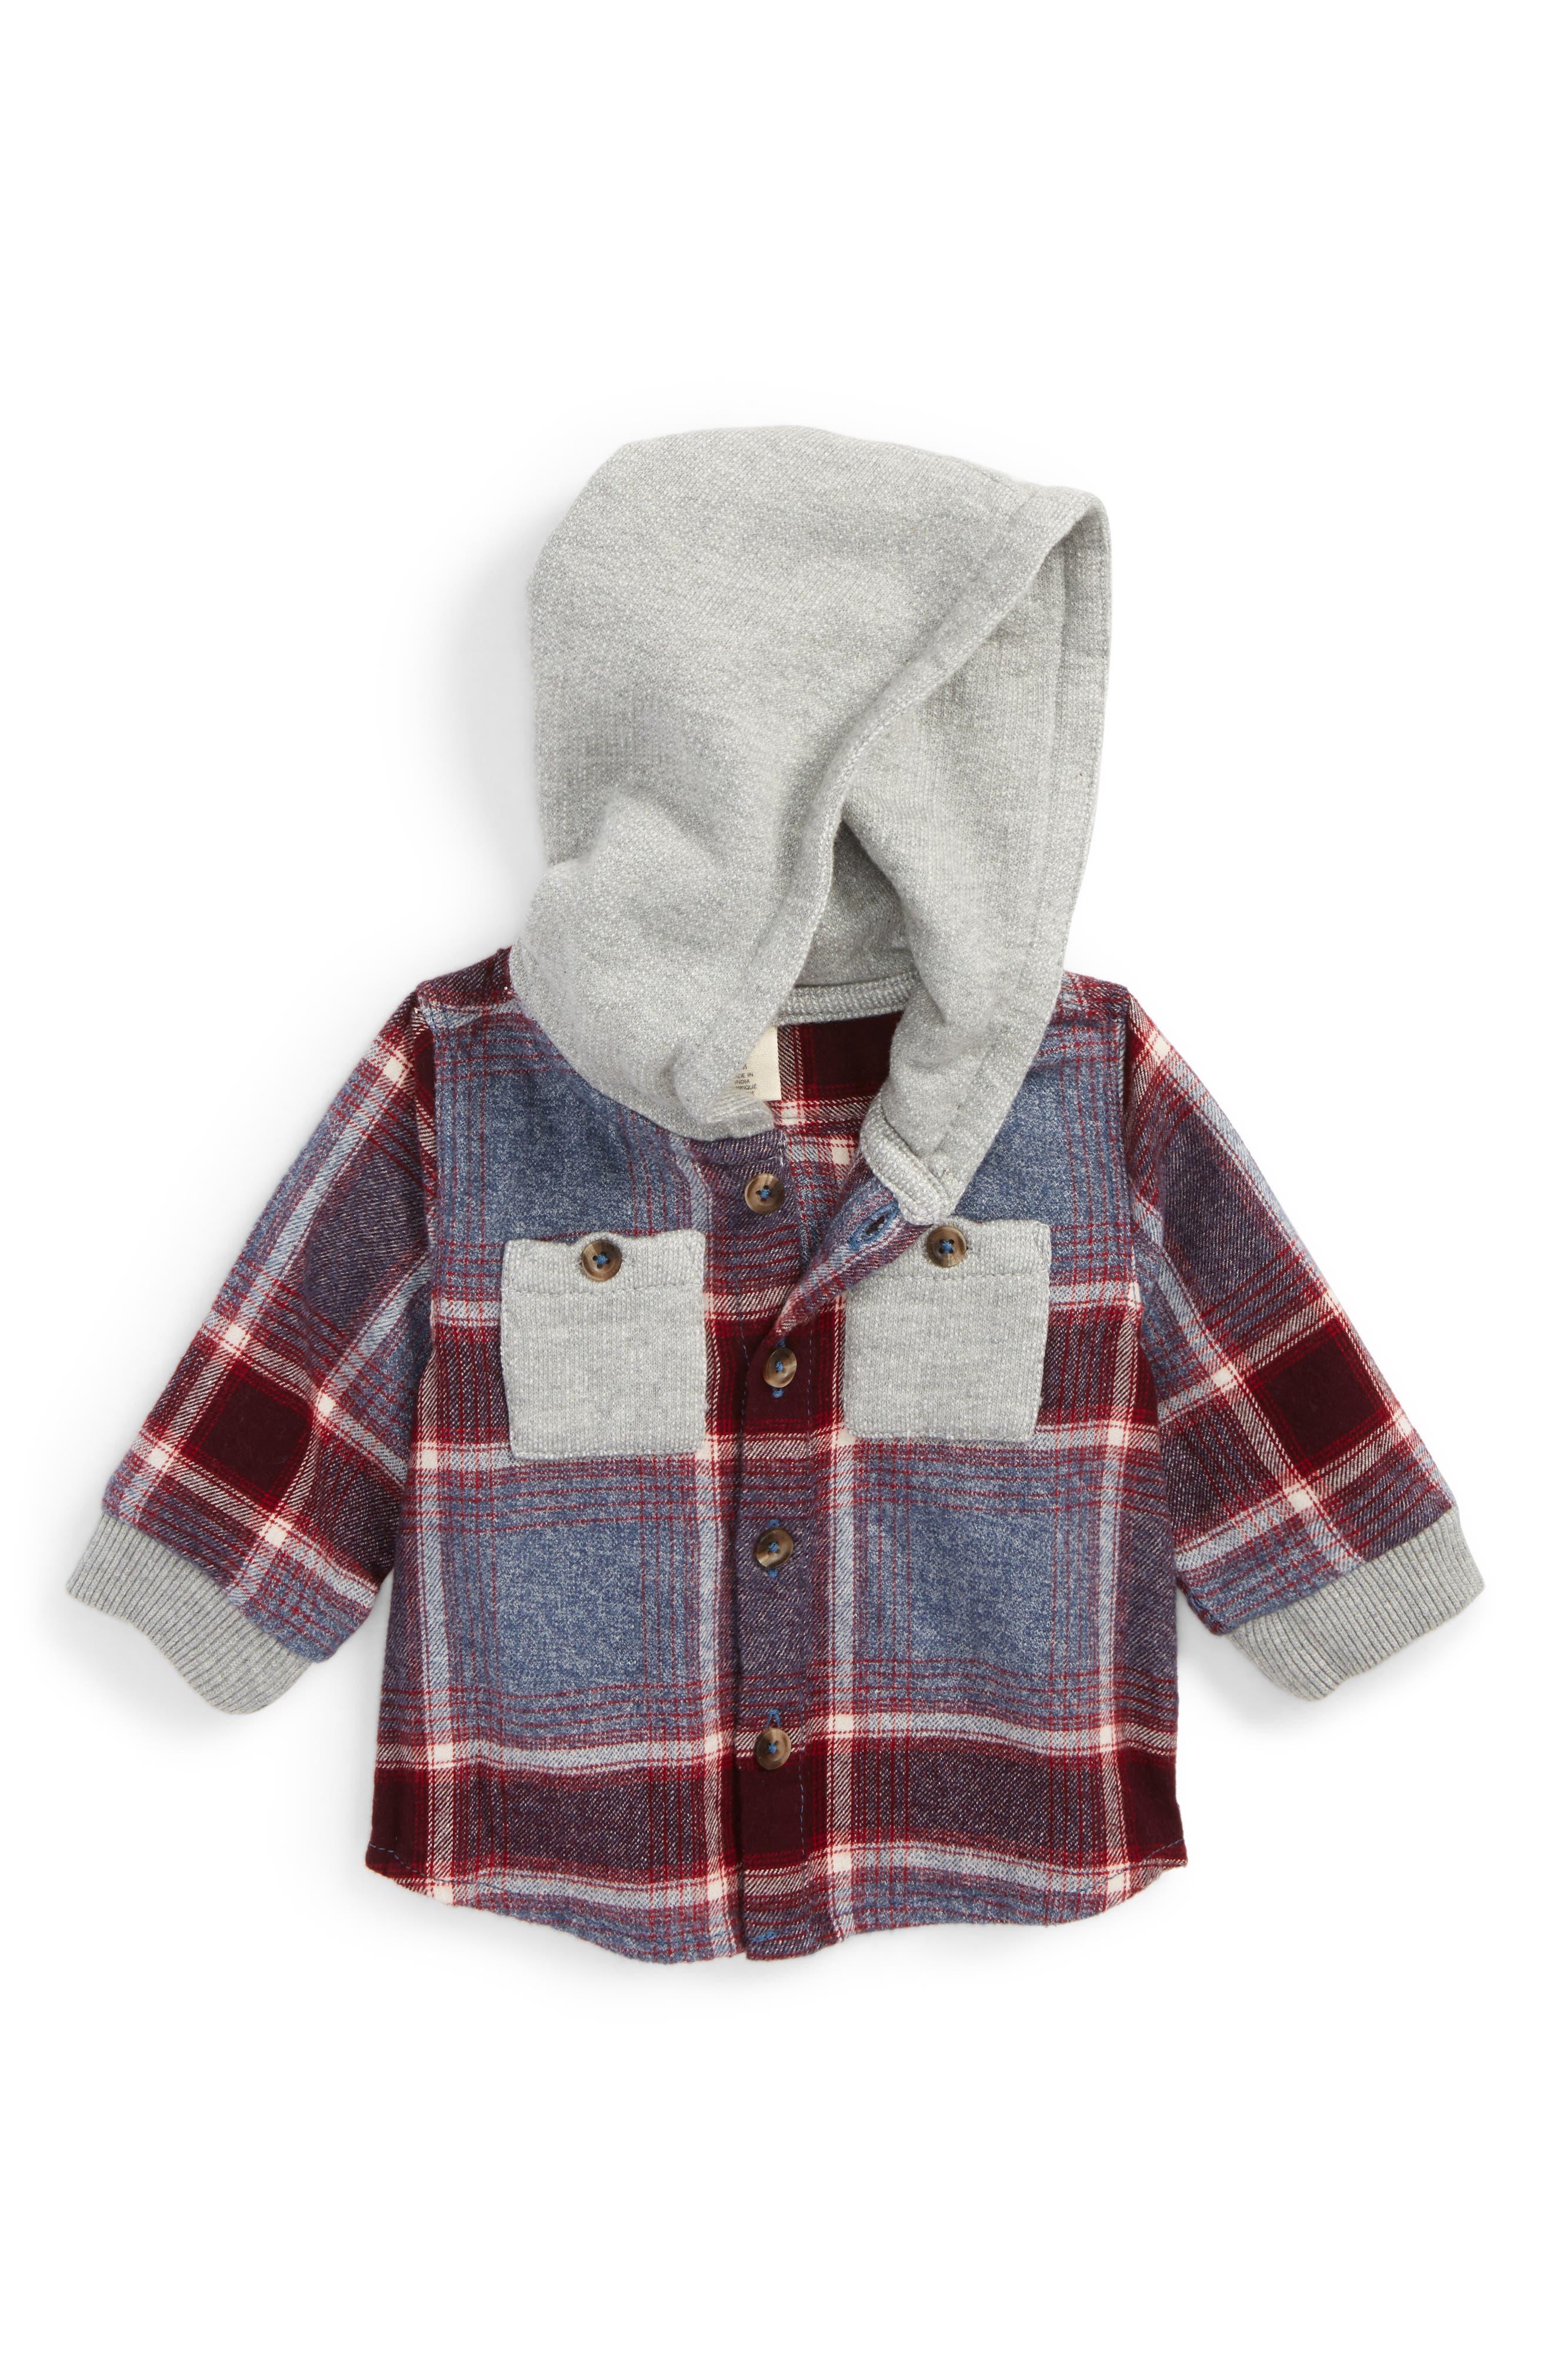 Main Image - Tucker + Tate Hooded Flannel Shirt (Baby Boys)